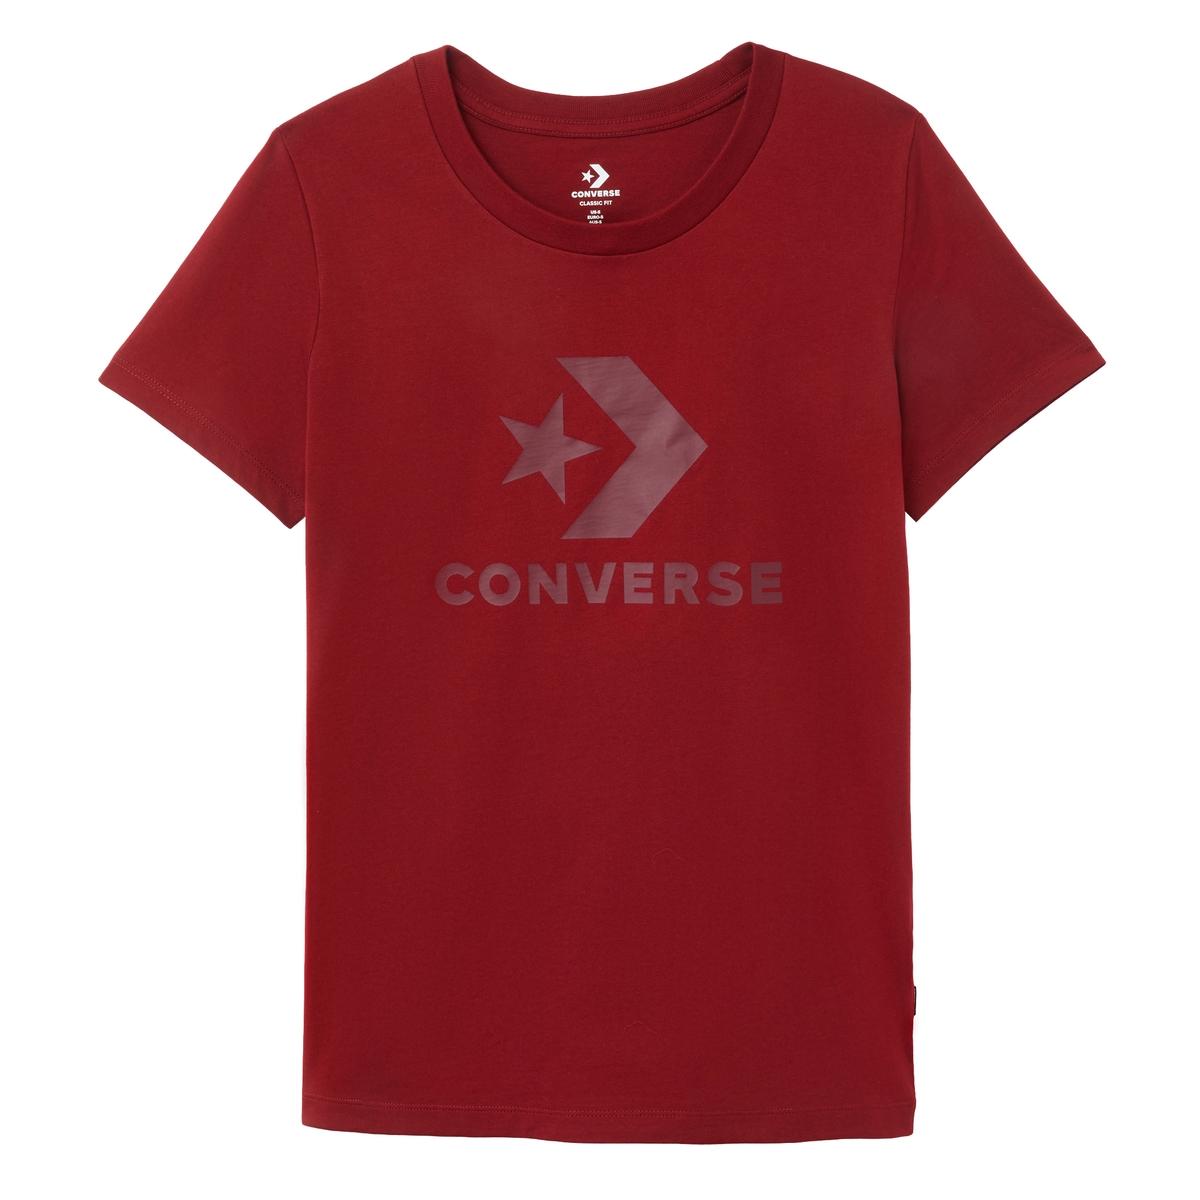 Camiseta Star Chevron Tee 100% algodón